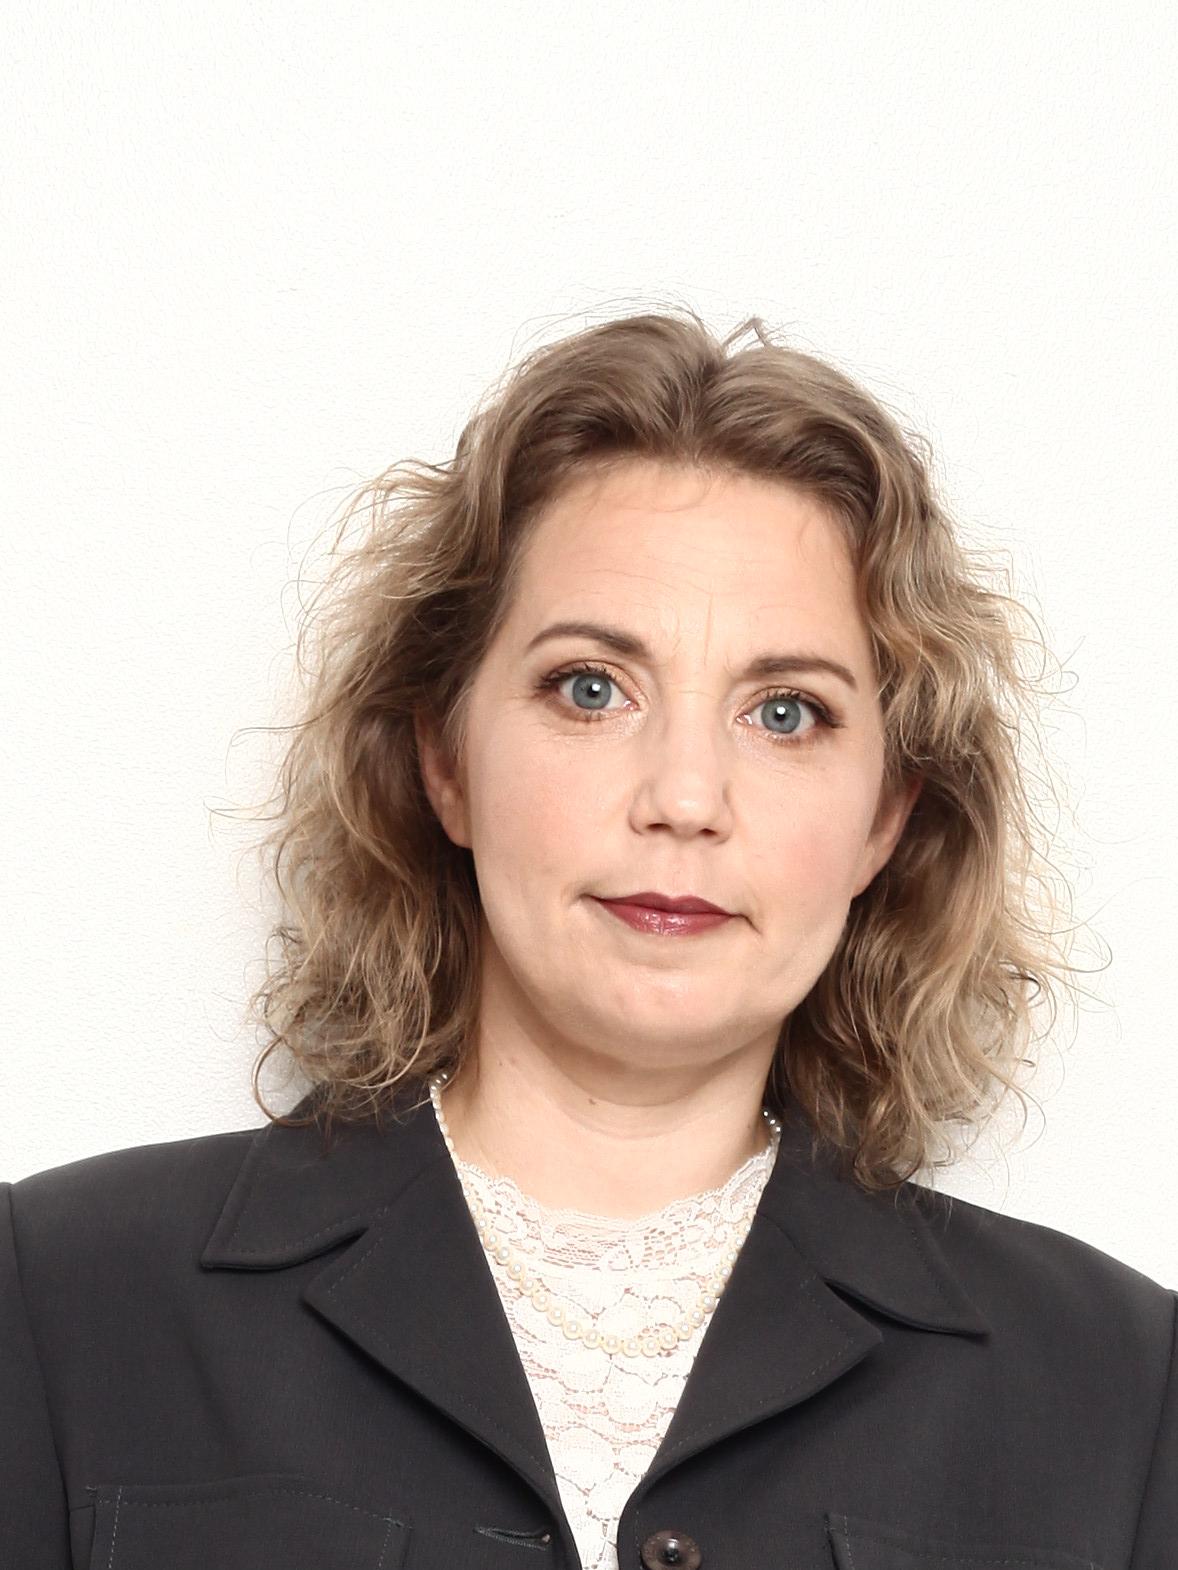 Anne Engel